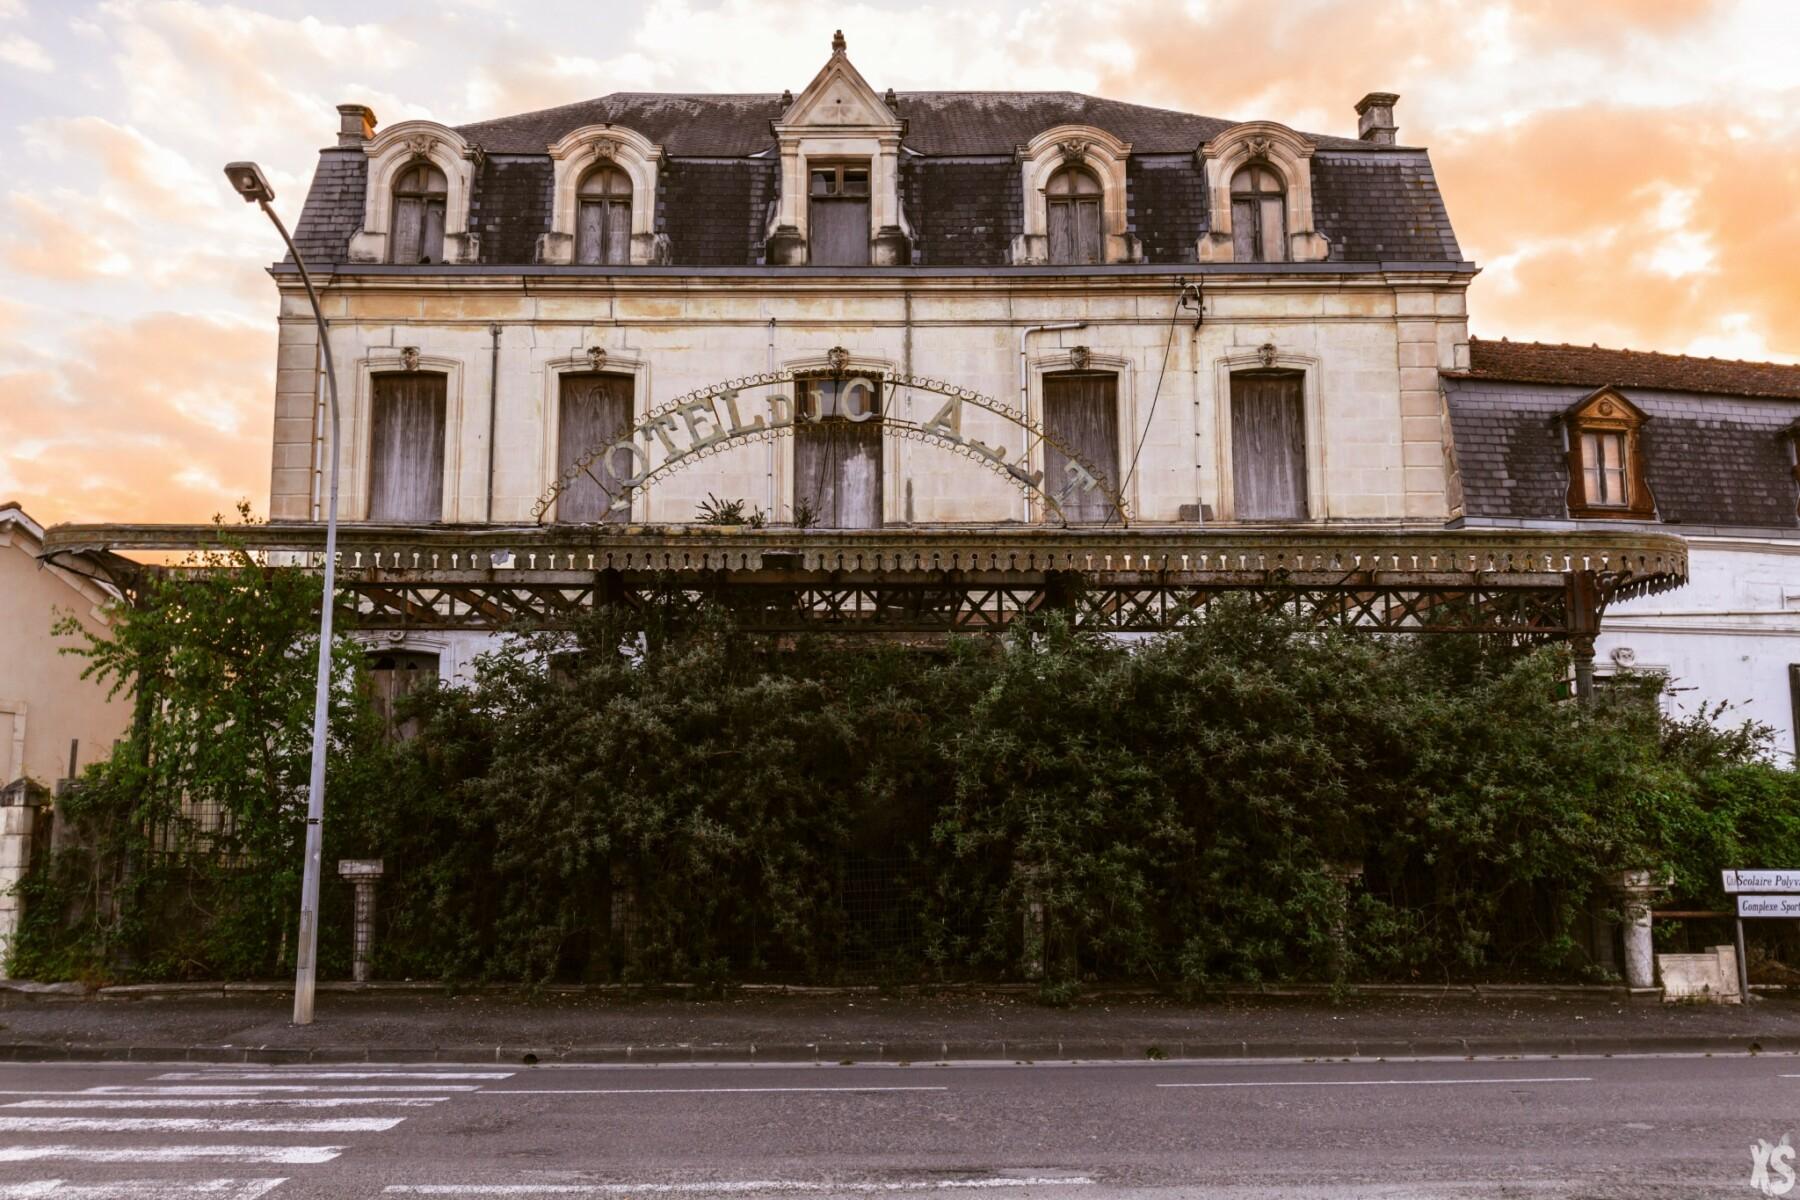 Hôtel abandonné en France | urbexsession.com/hotel-chalet-saint-jean-dangely | Urbex France